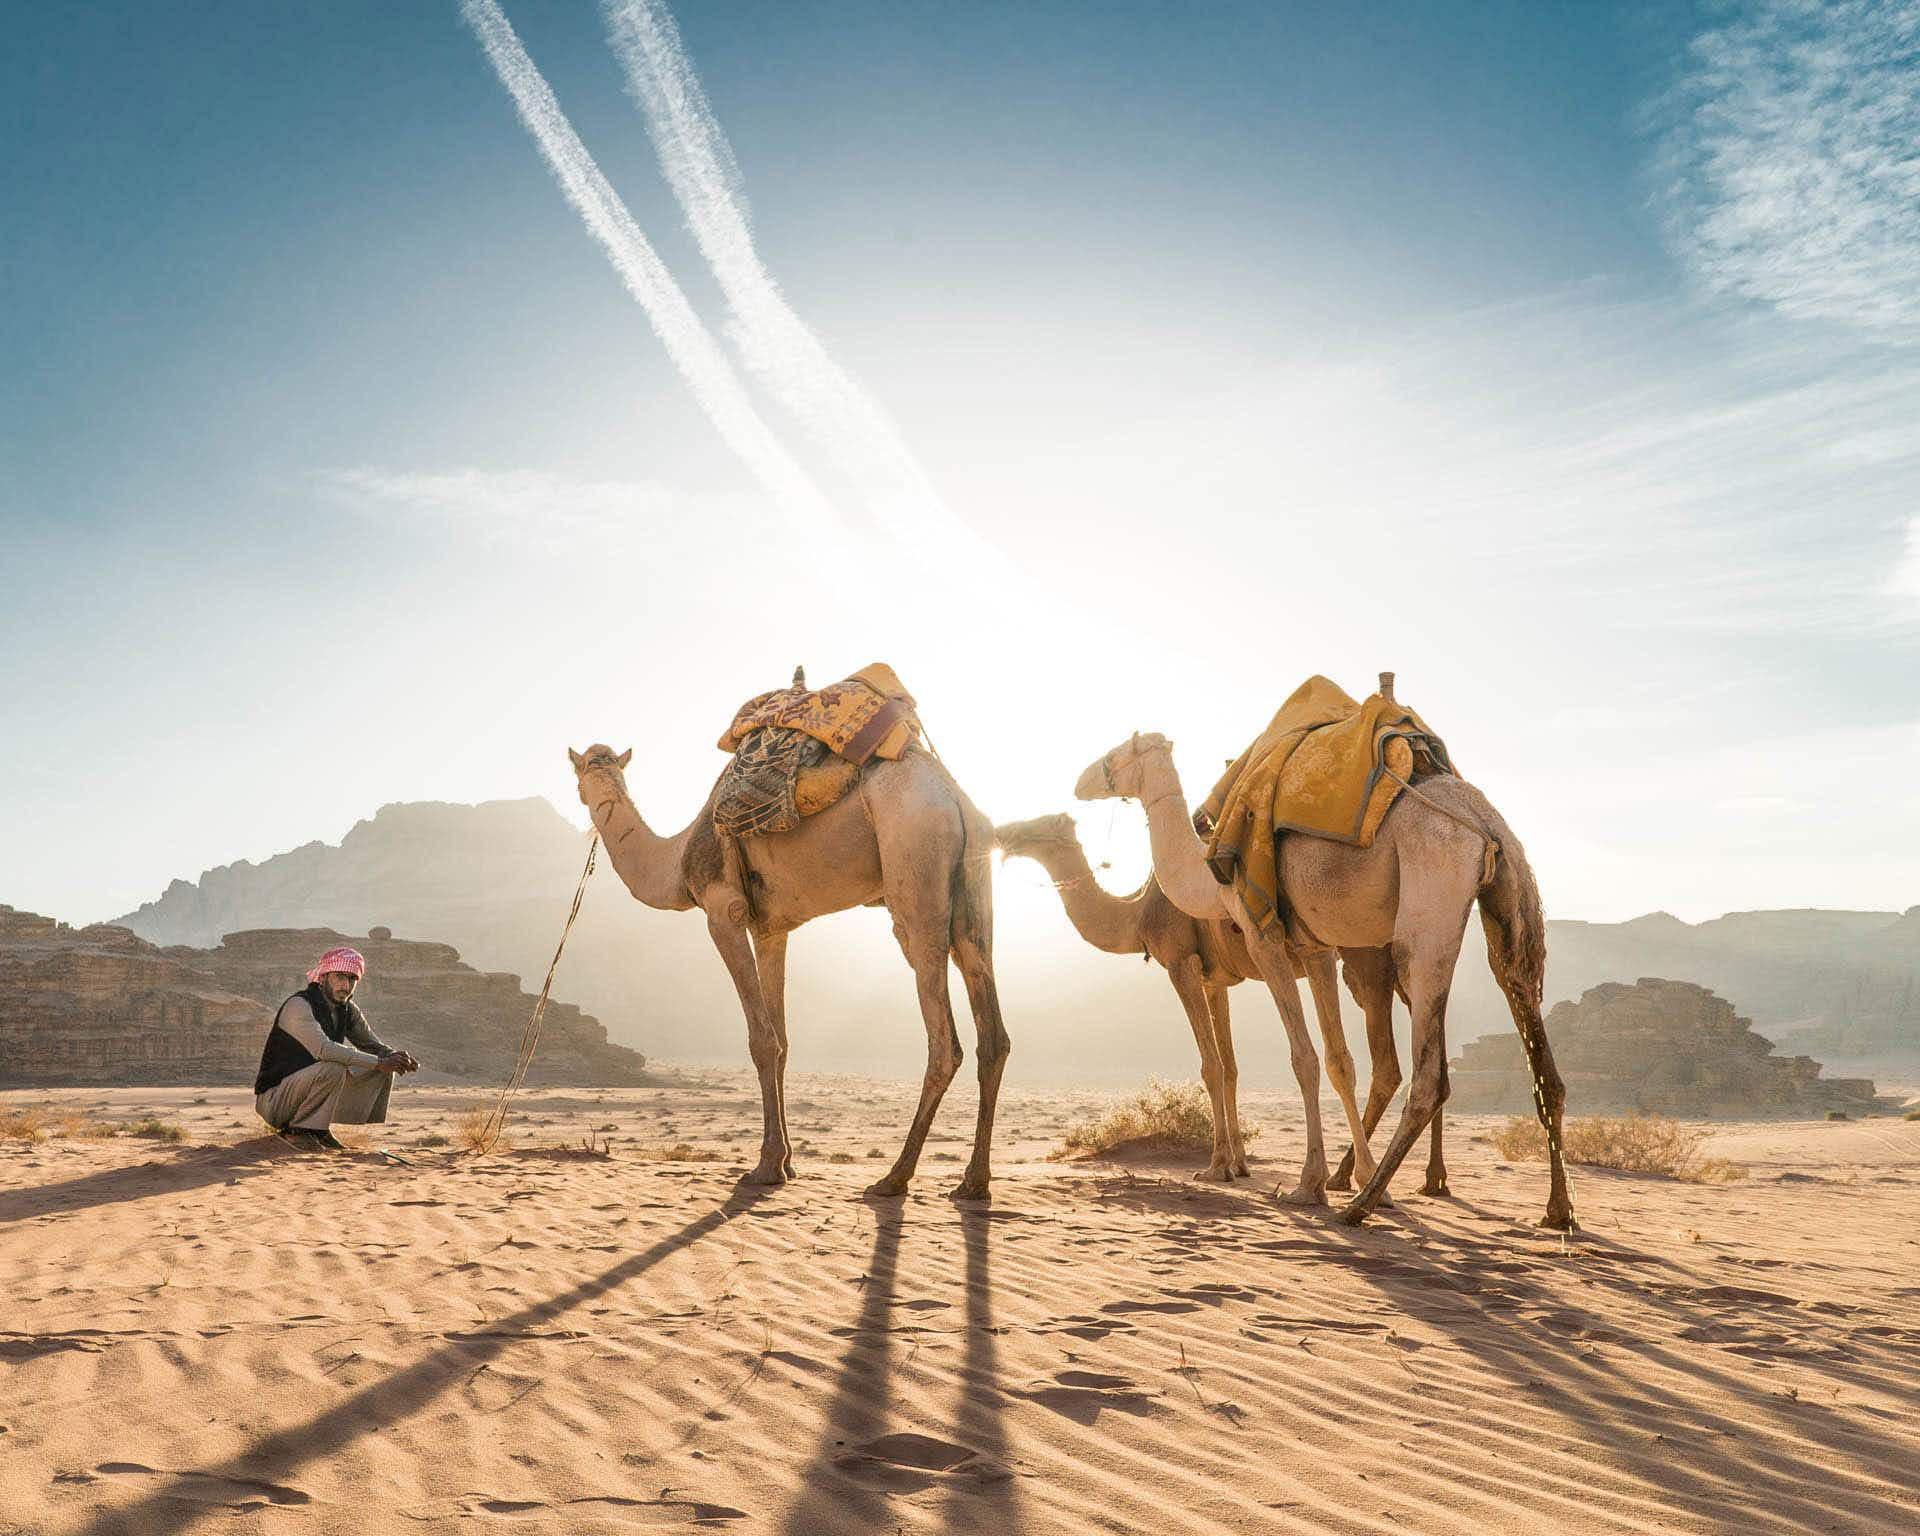 This beautiful short highlights the diverse beauty of Jordan